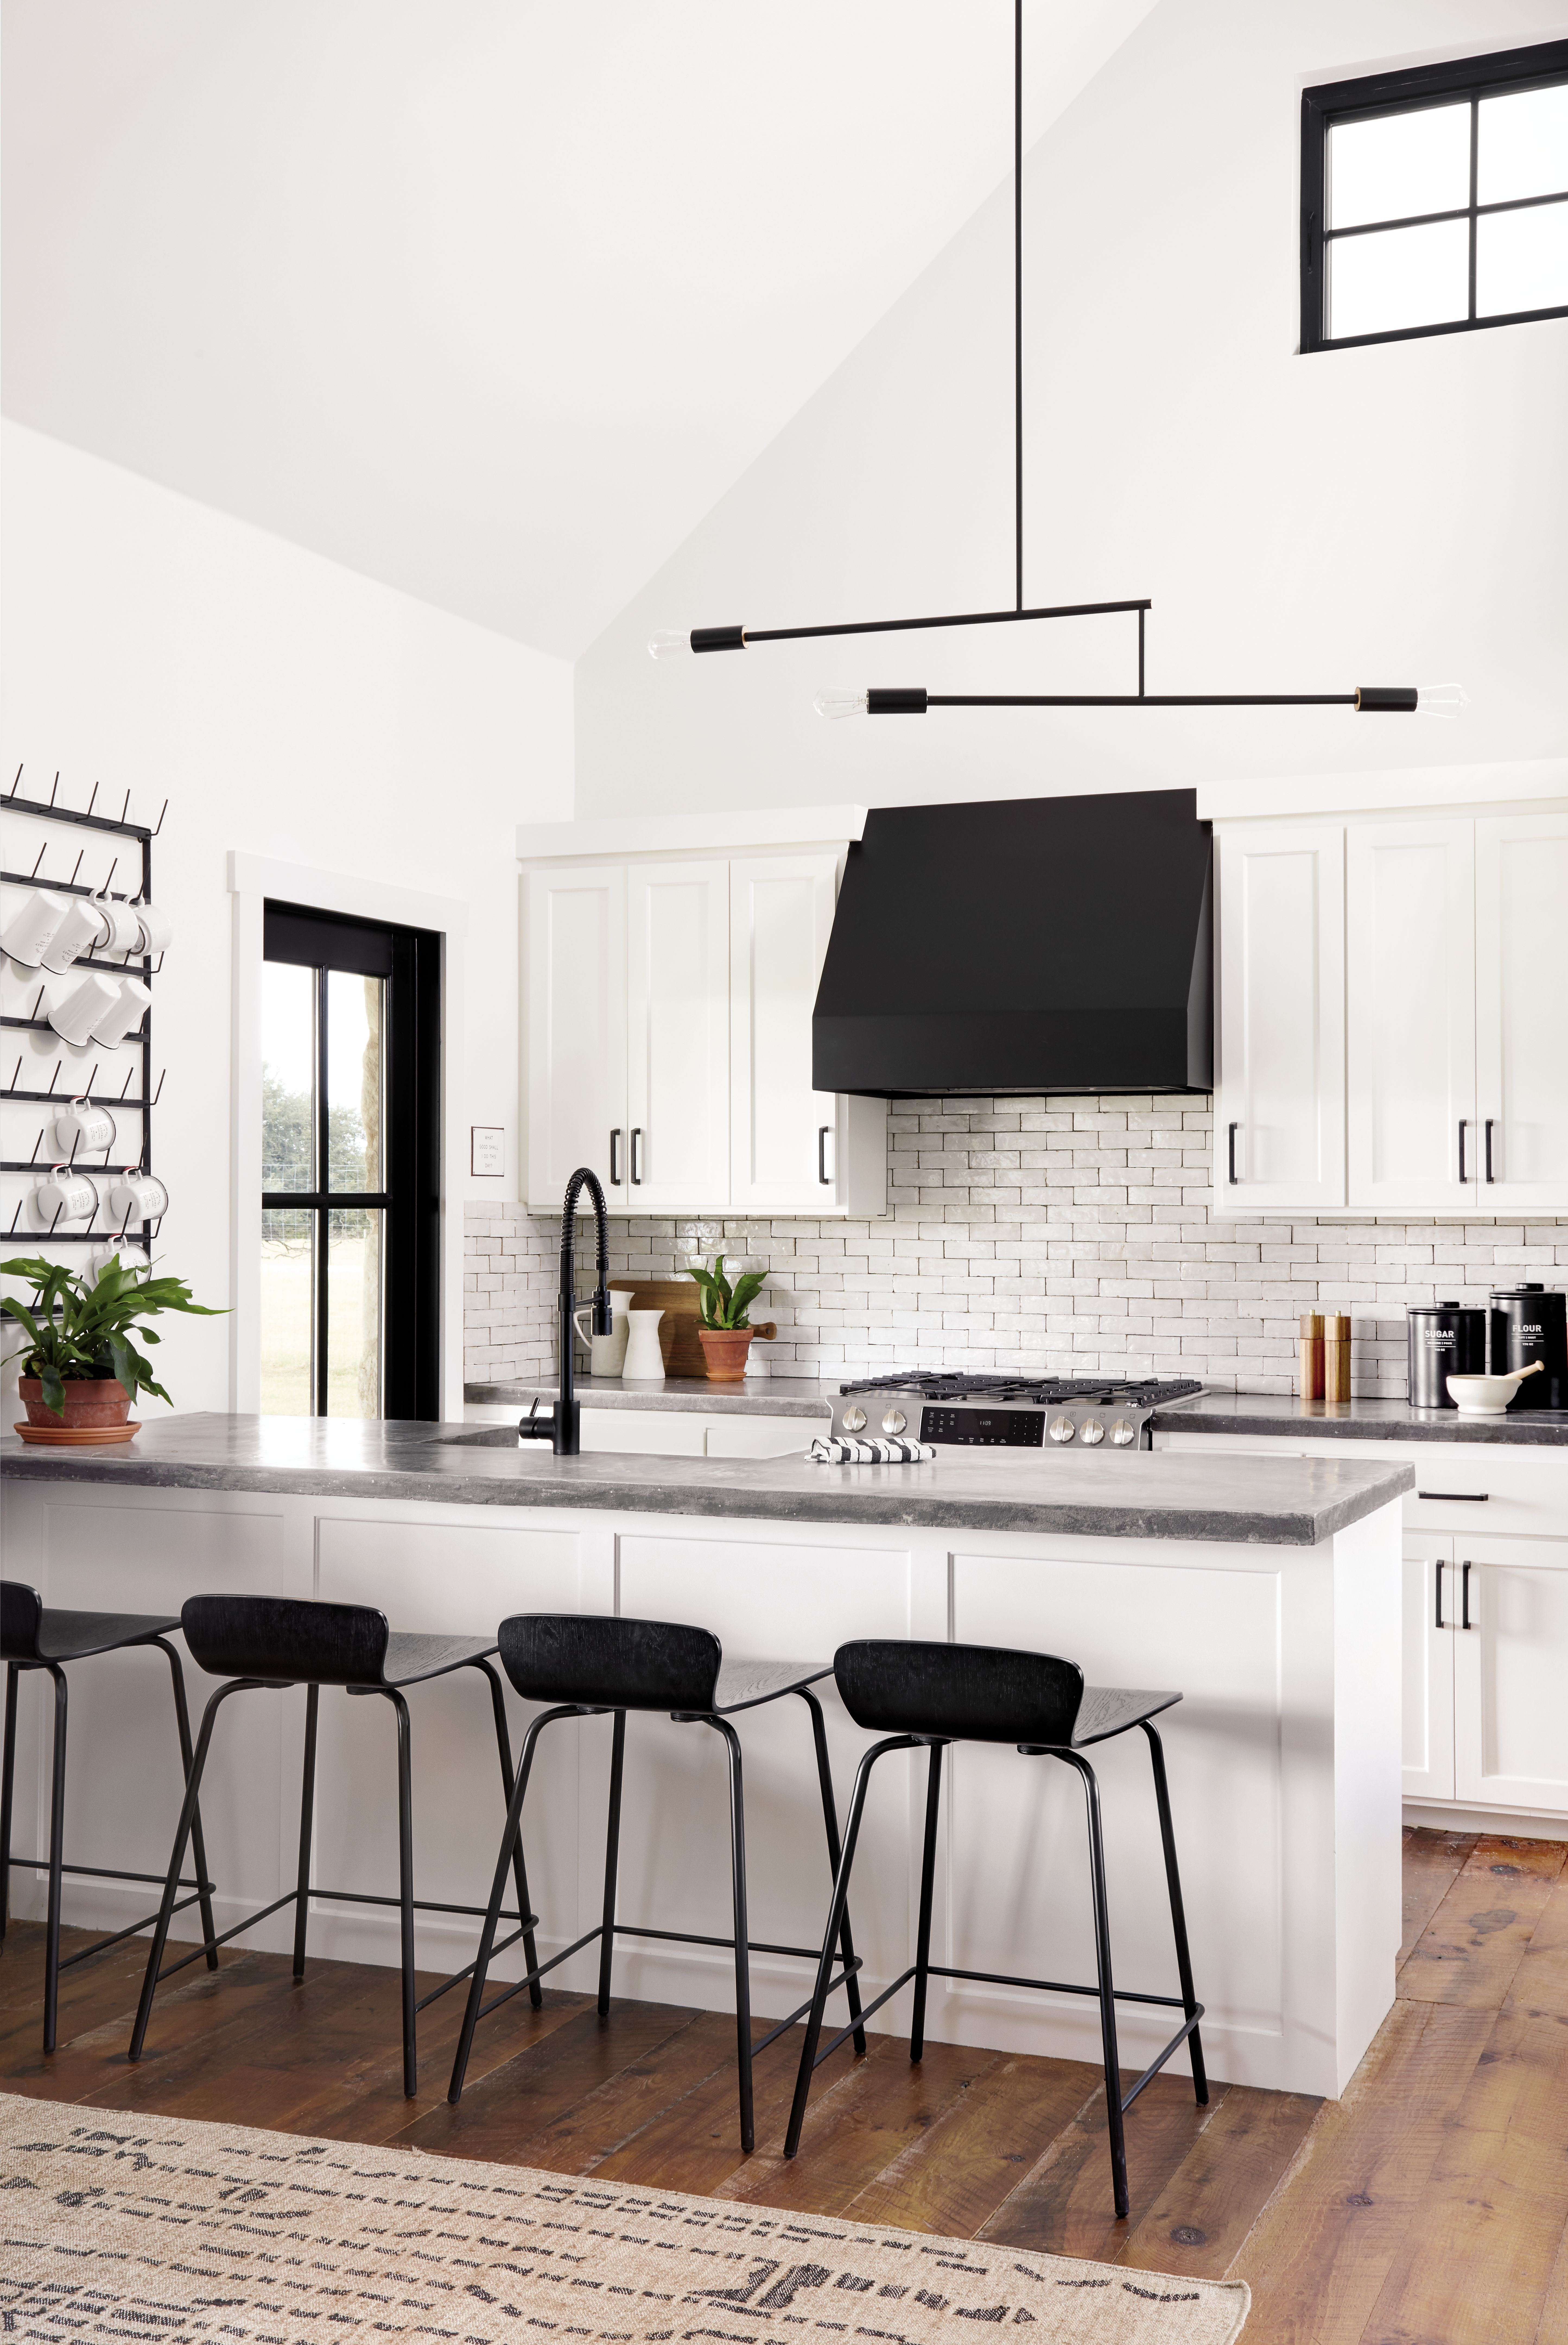 joanna gaines new design book homebody 2018 release modern kitchen design modern farmhouse on farmhouse kitchen joanna gaines design id=88116